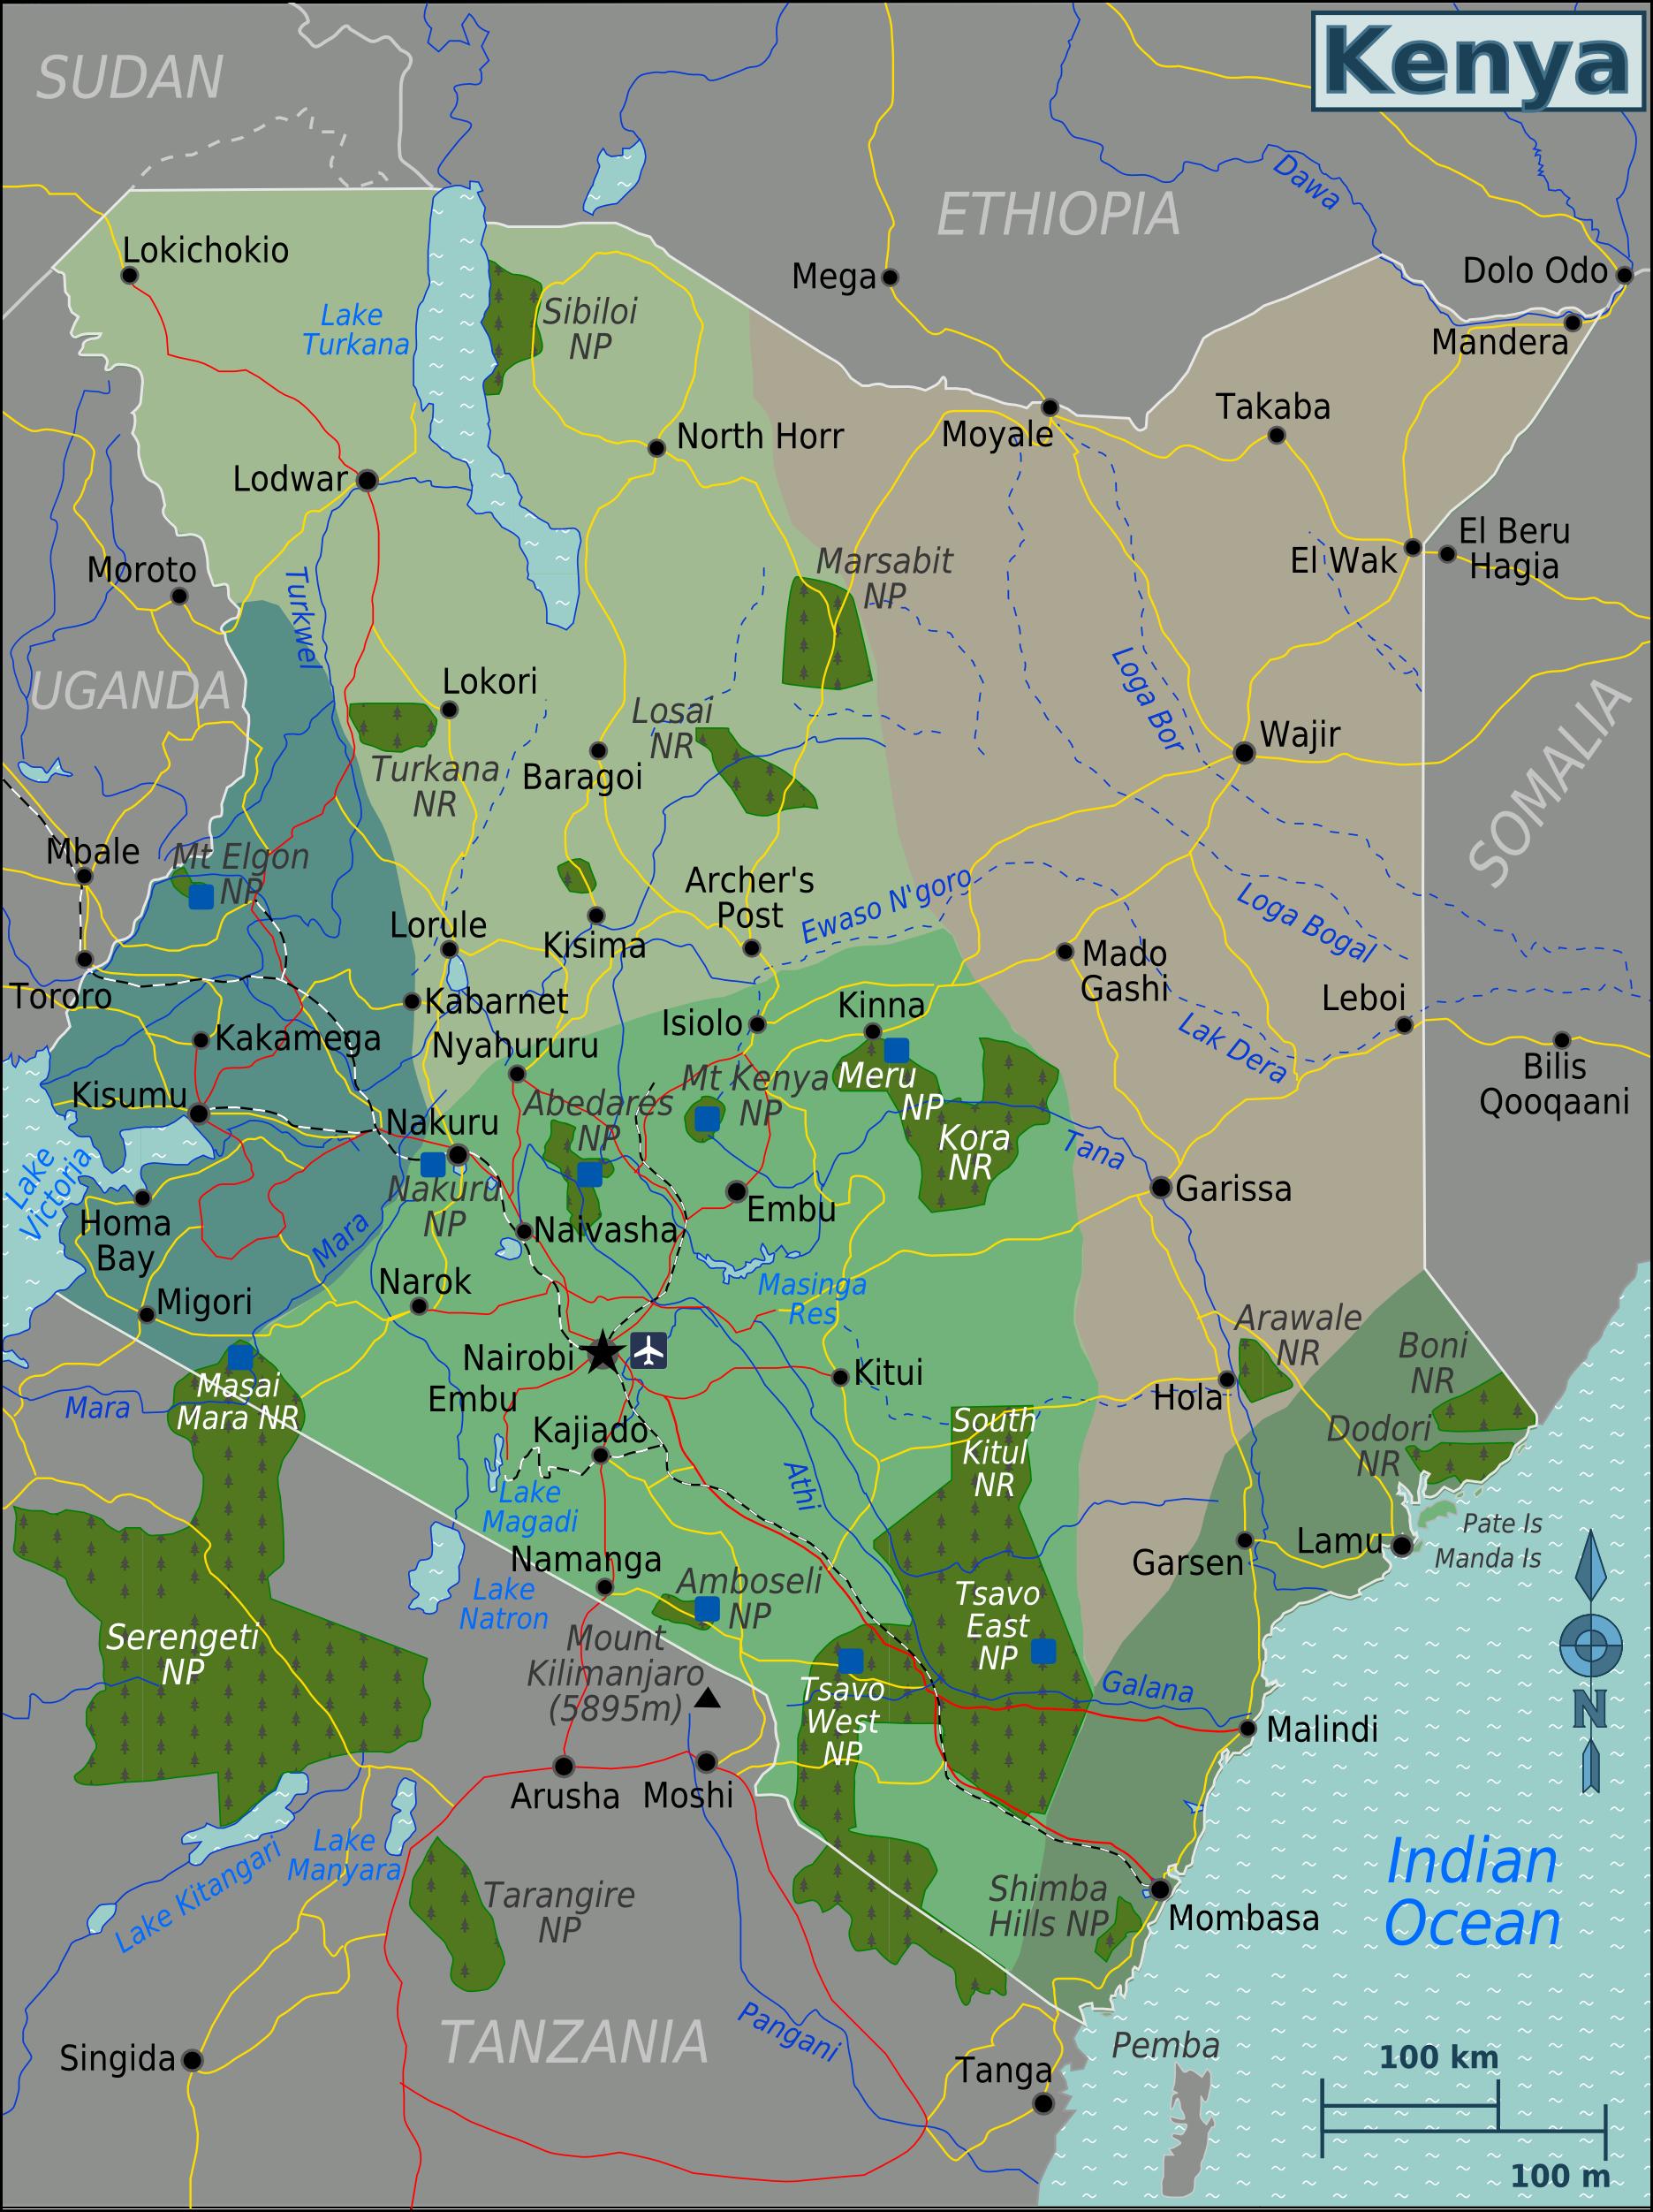 kenia karte Landkarte Kenia (Karte Regionen) : Weltkarte.  Karten und  kenia karte